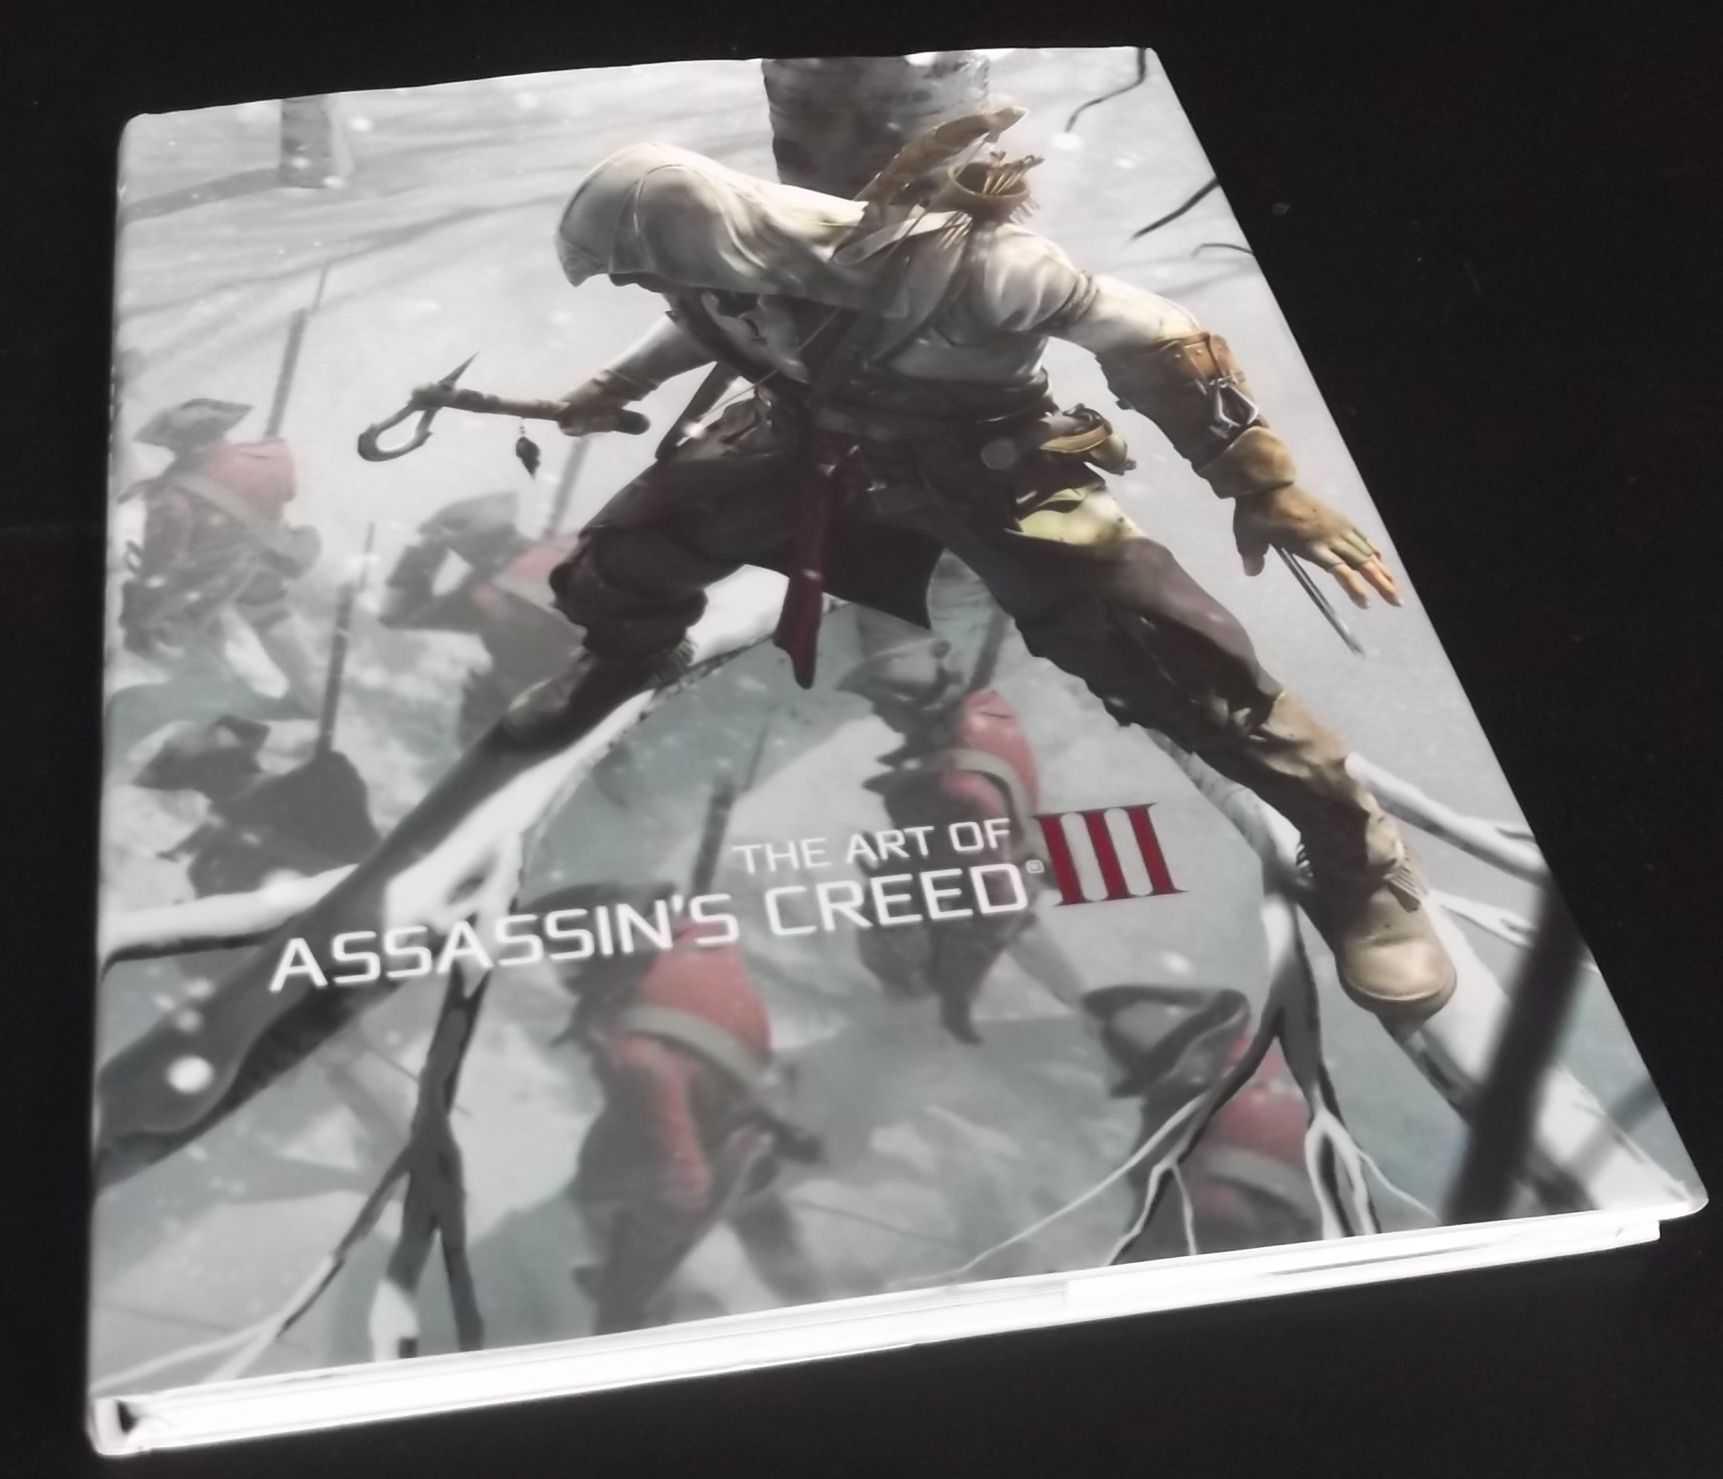 ANDY MCVITTIE - The Art of Assassins Creed III